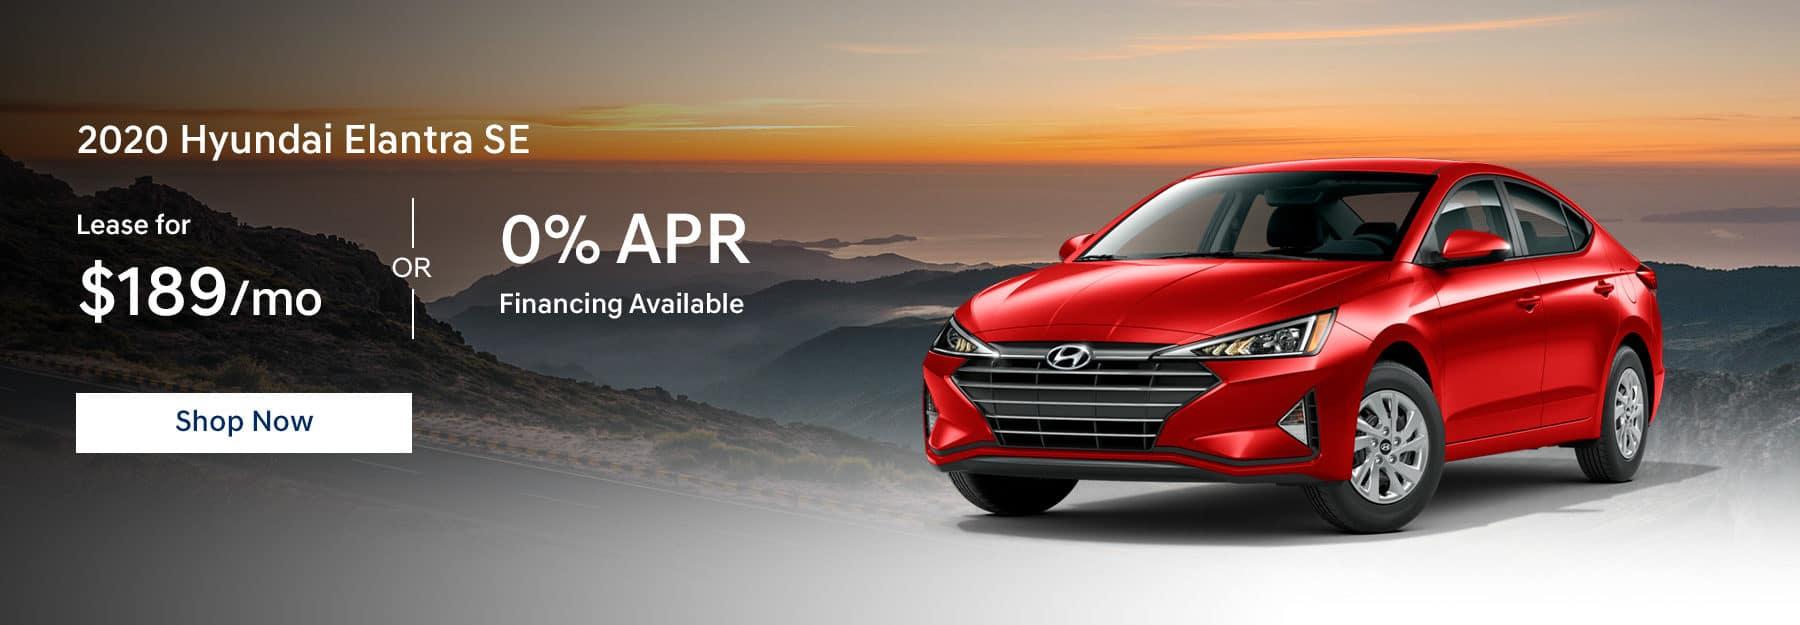 2020 Hyundai Elantra Lease for $189/mo or 0% APR